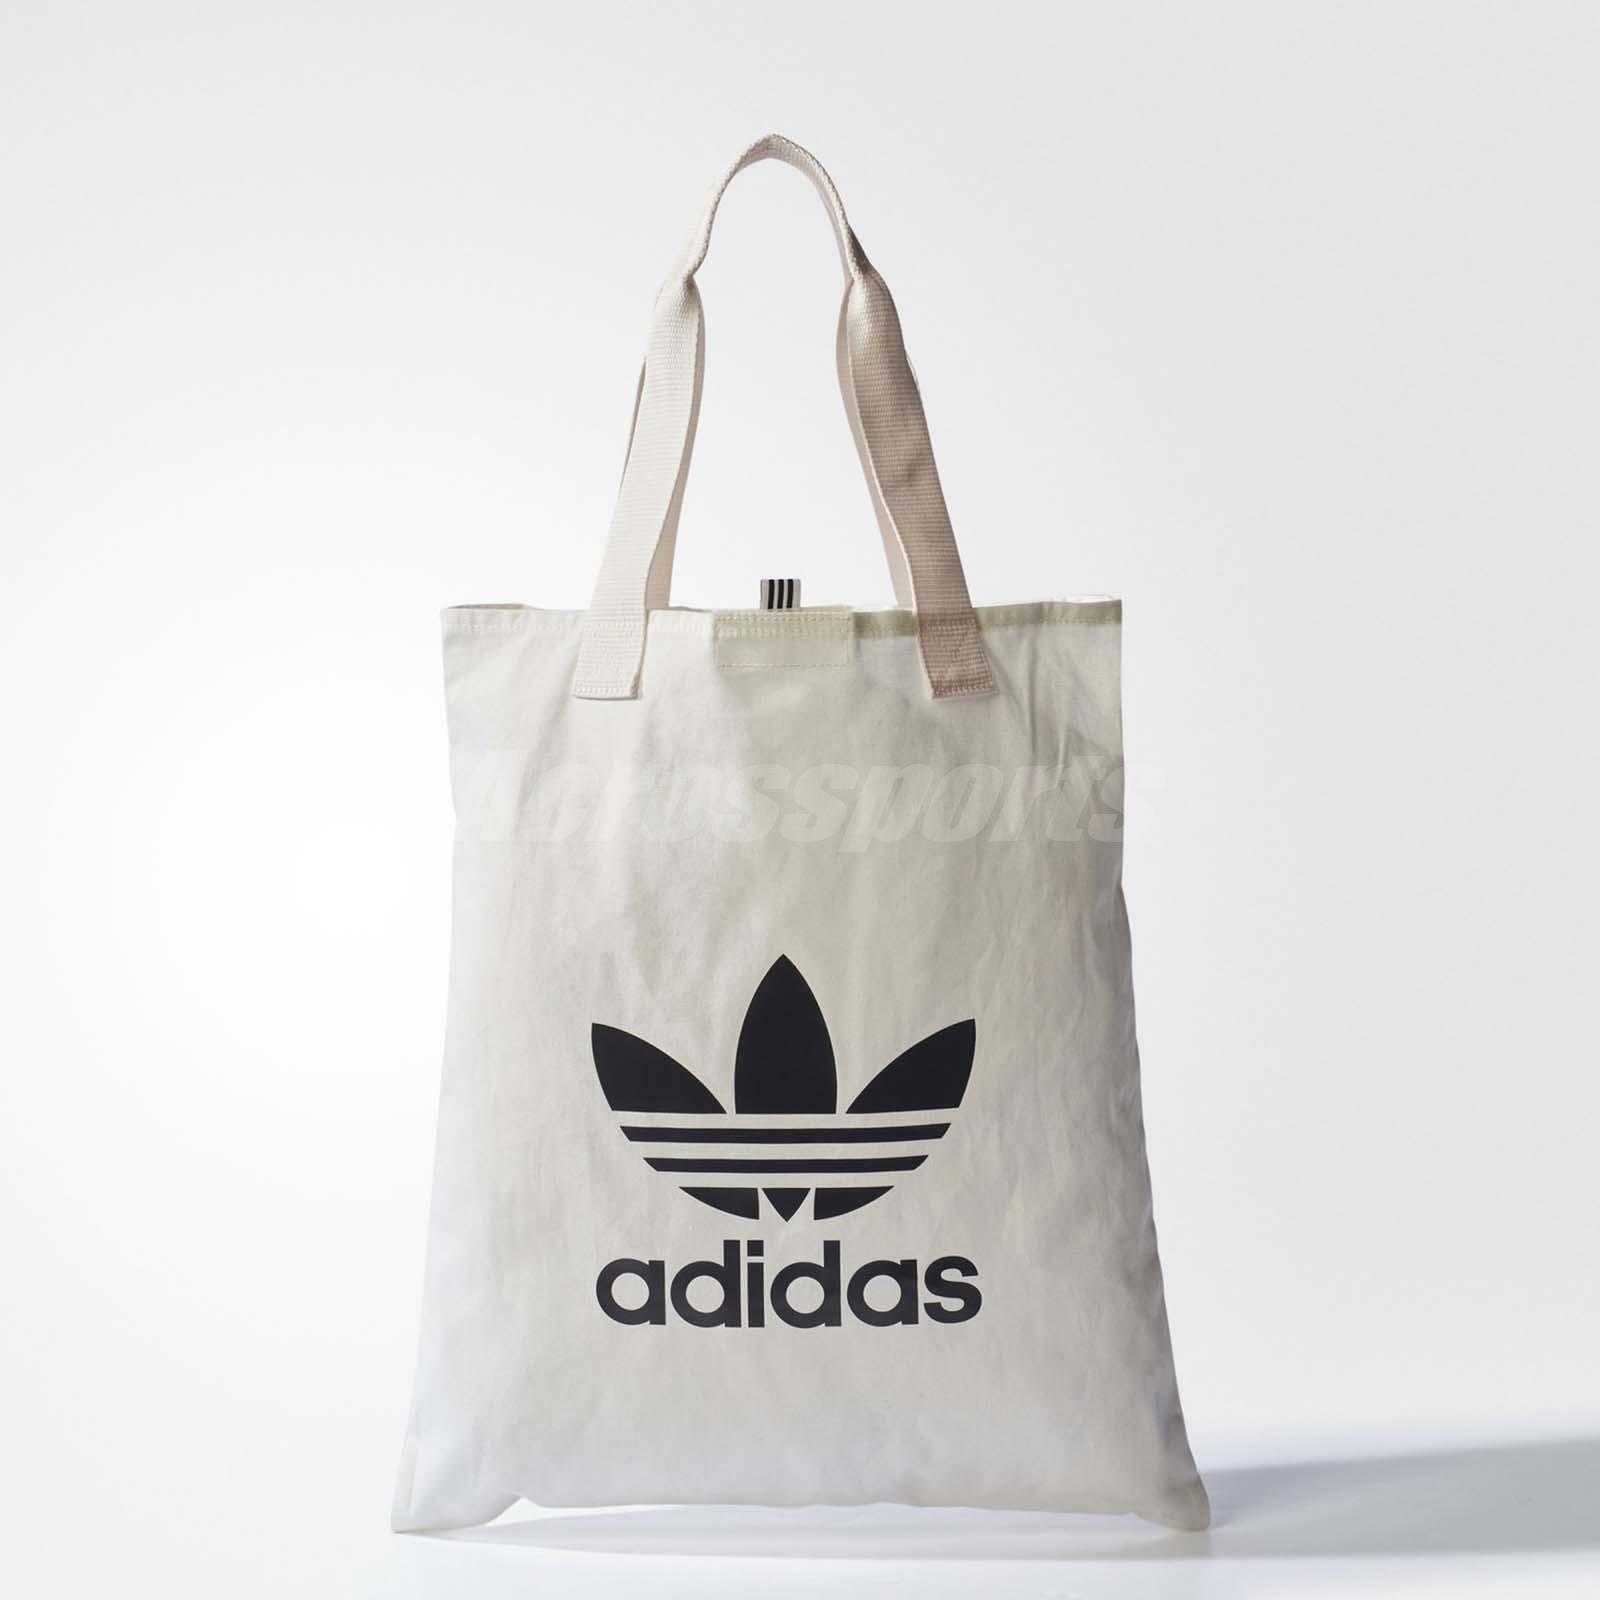 8f998c82dec Details about adidas Unisex Originals Shopper Bag Tote Shoulder Bag White  Black BQ7569